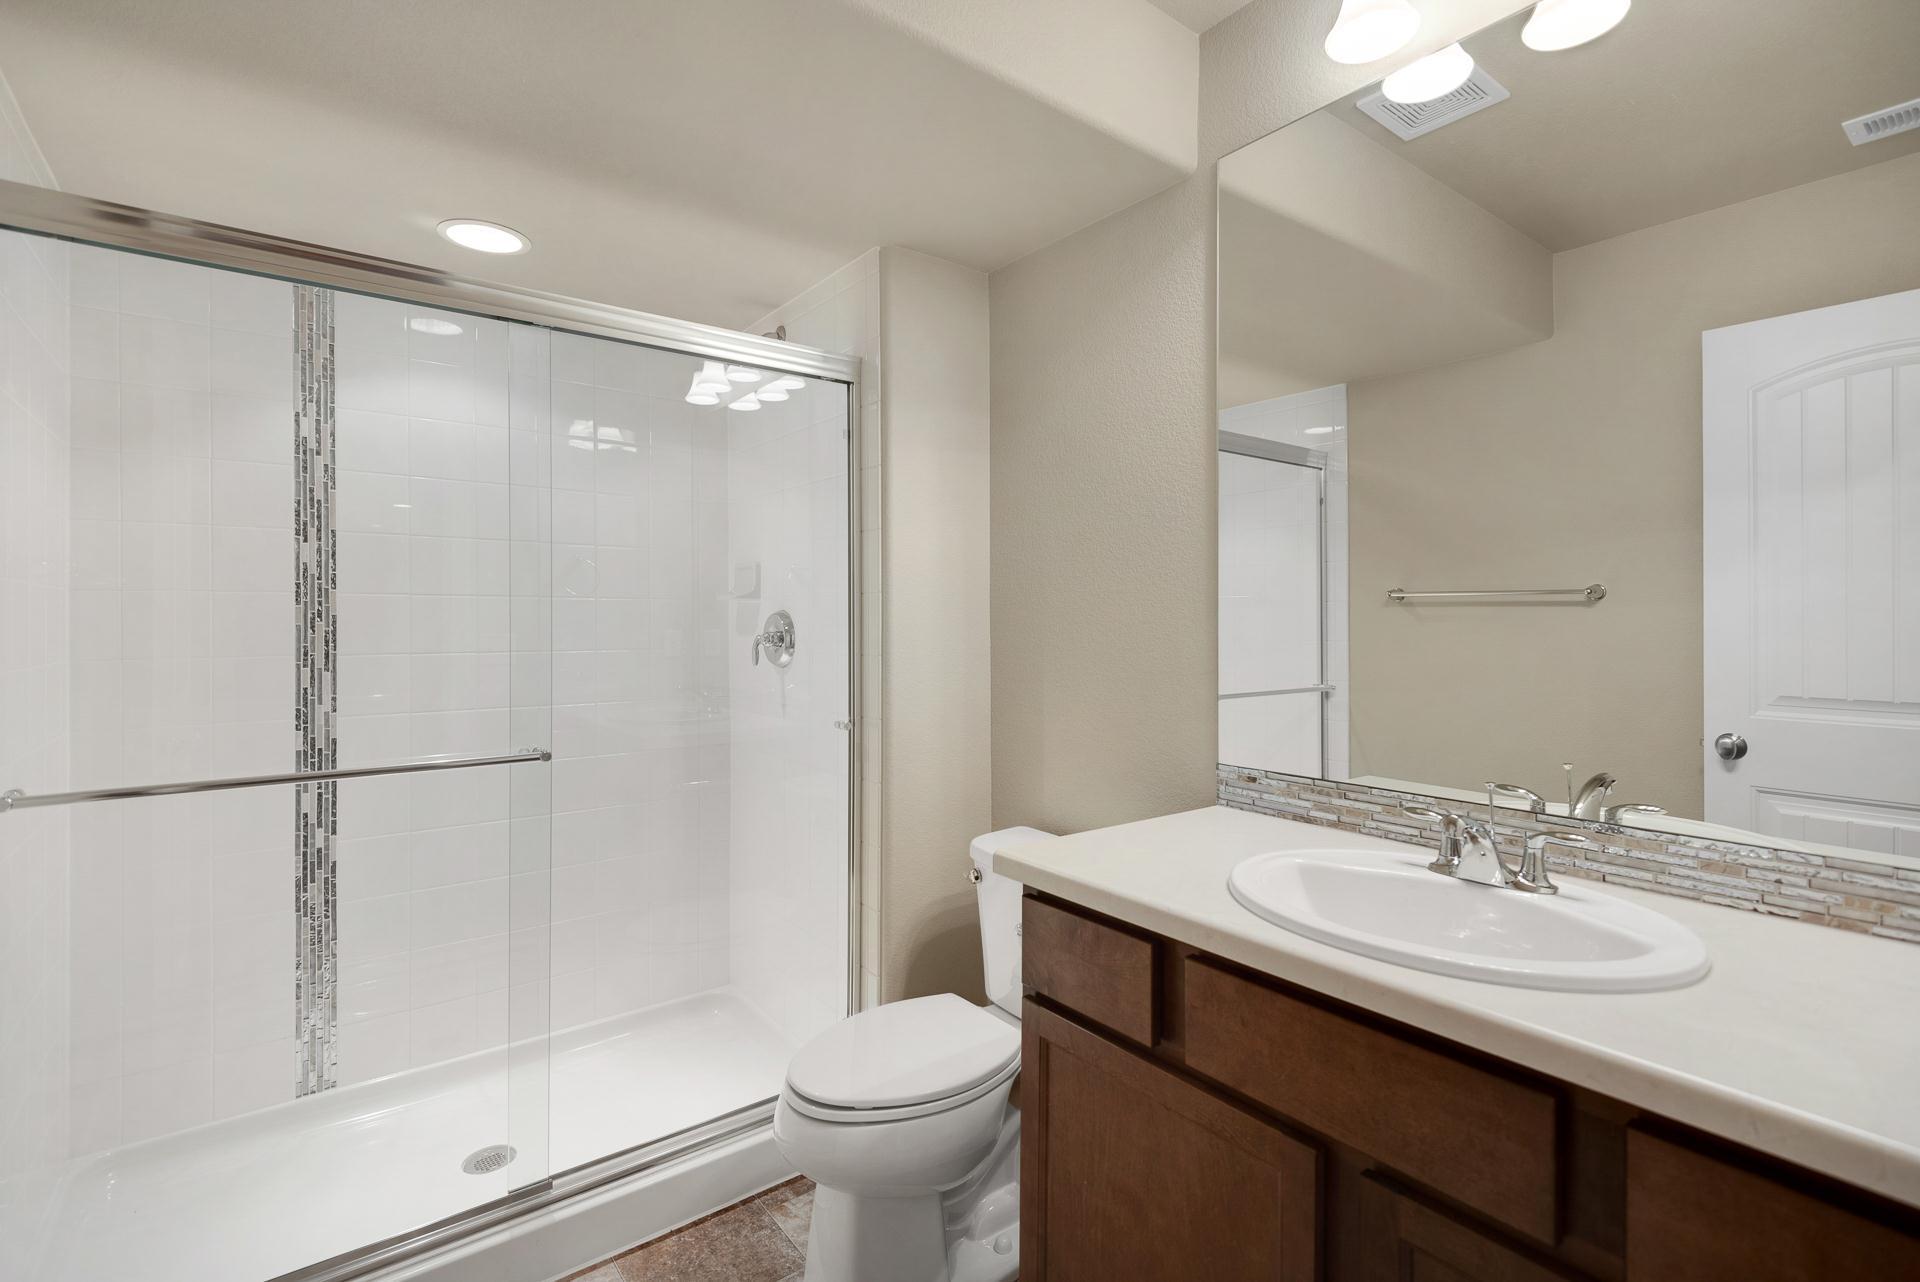 Bathroom featured in the Appaloosa II By Vantage Homes in Colorado Springs, CO